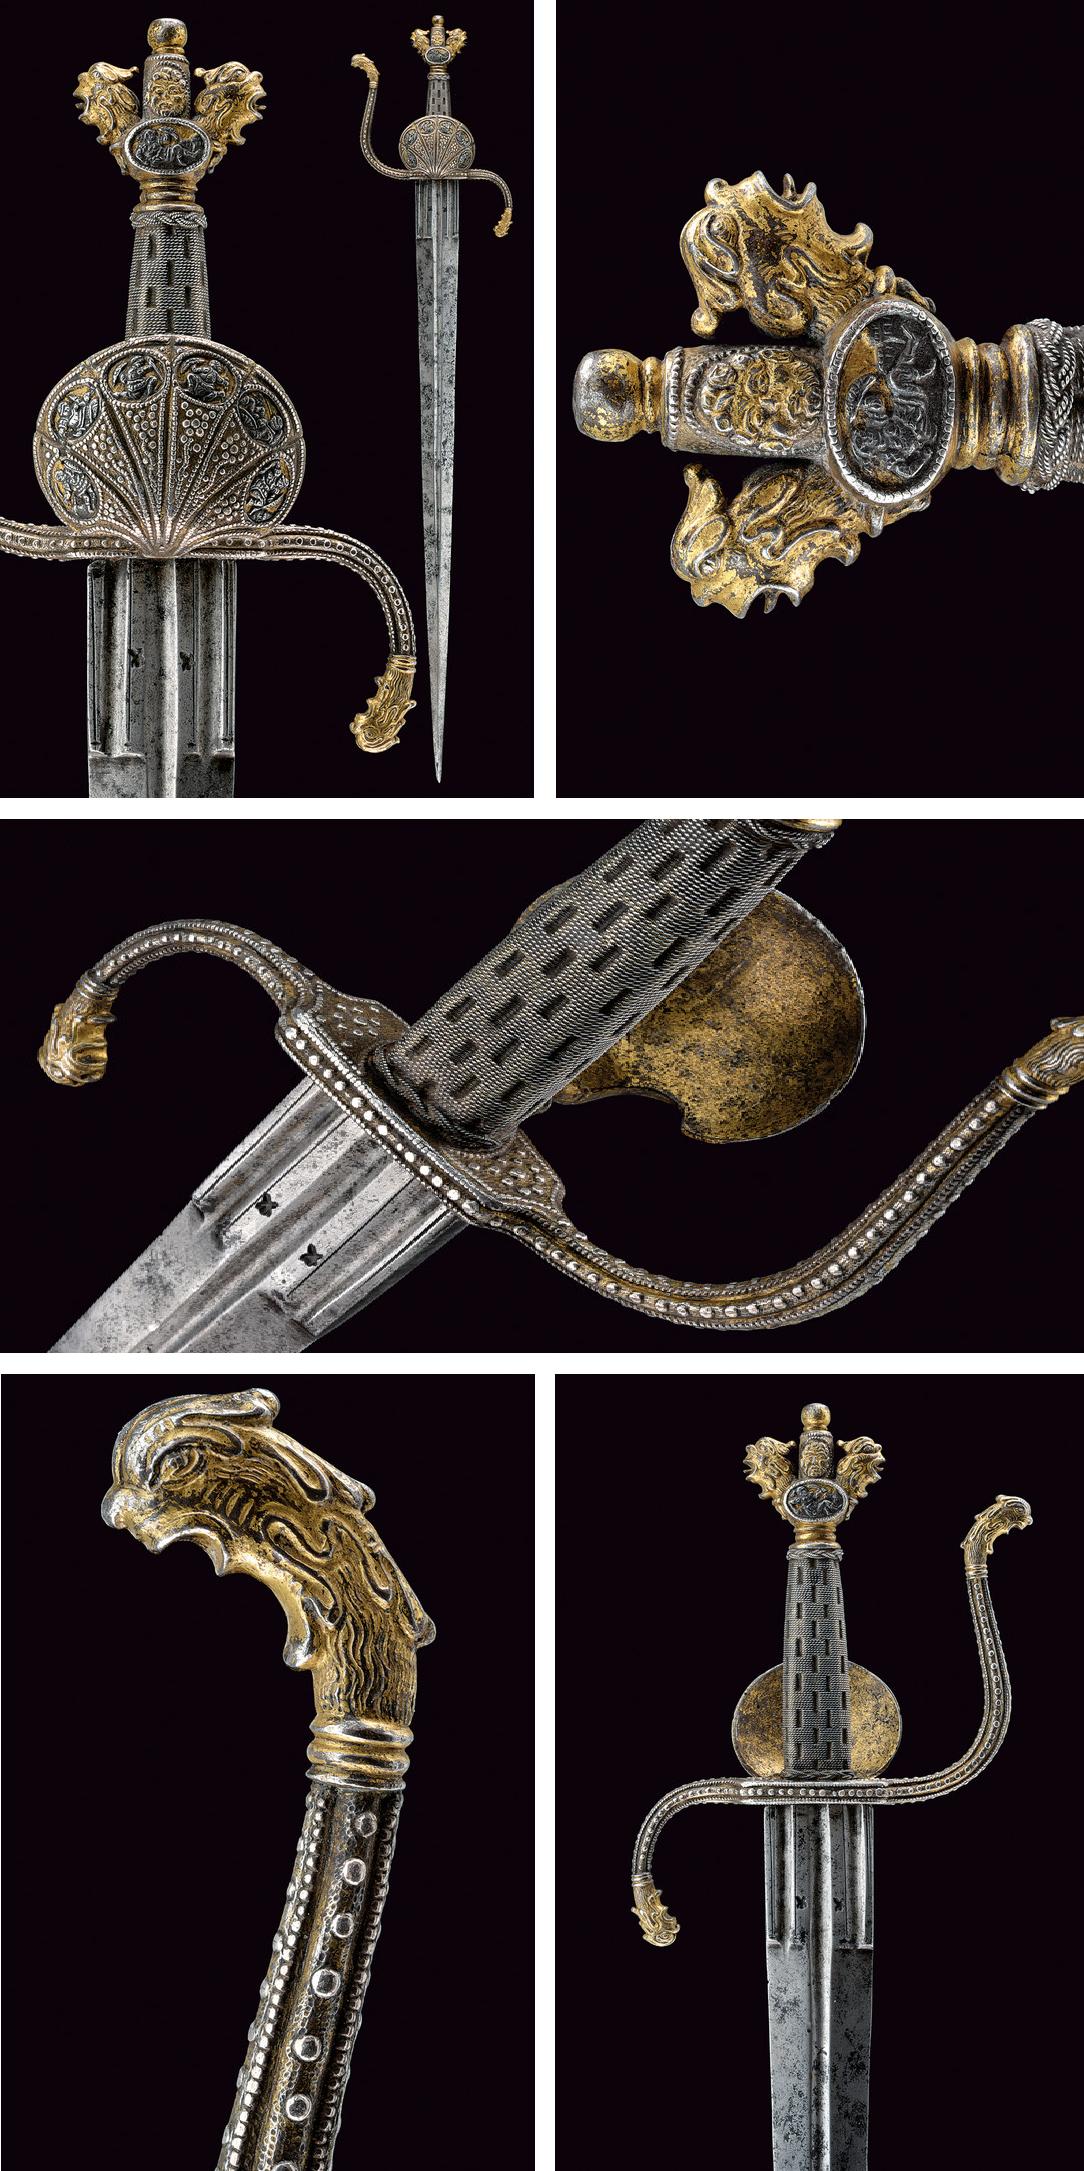 SWORDS, RAPIERS provenance: North Italy dating - Pinterest